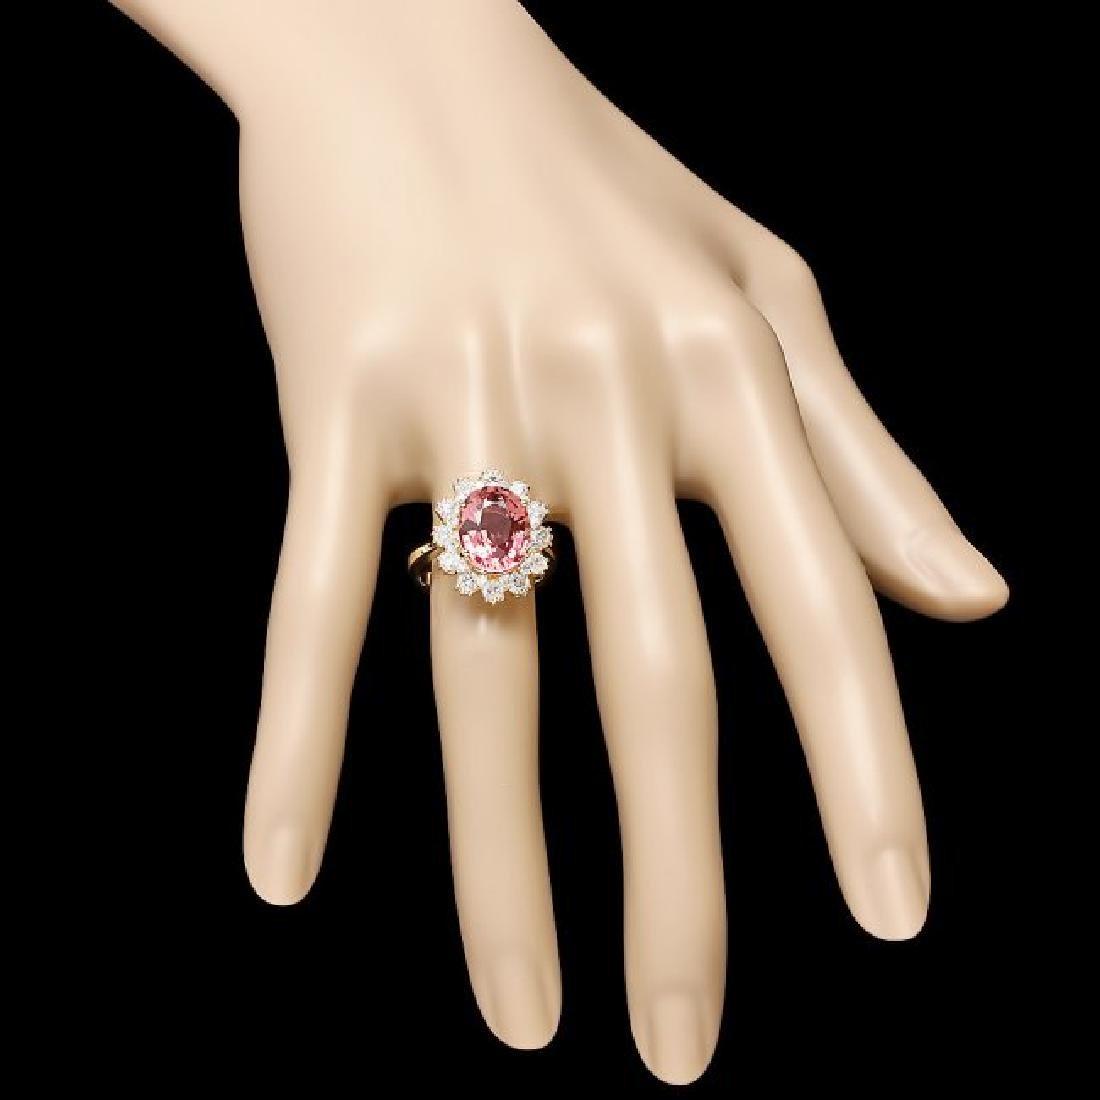 14k Gold 5ct Tourmaline 1.20ct Diamond Ring - 4